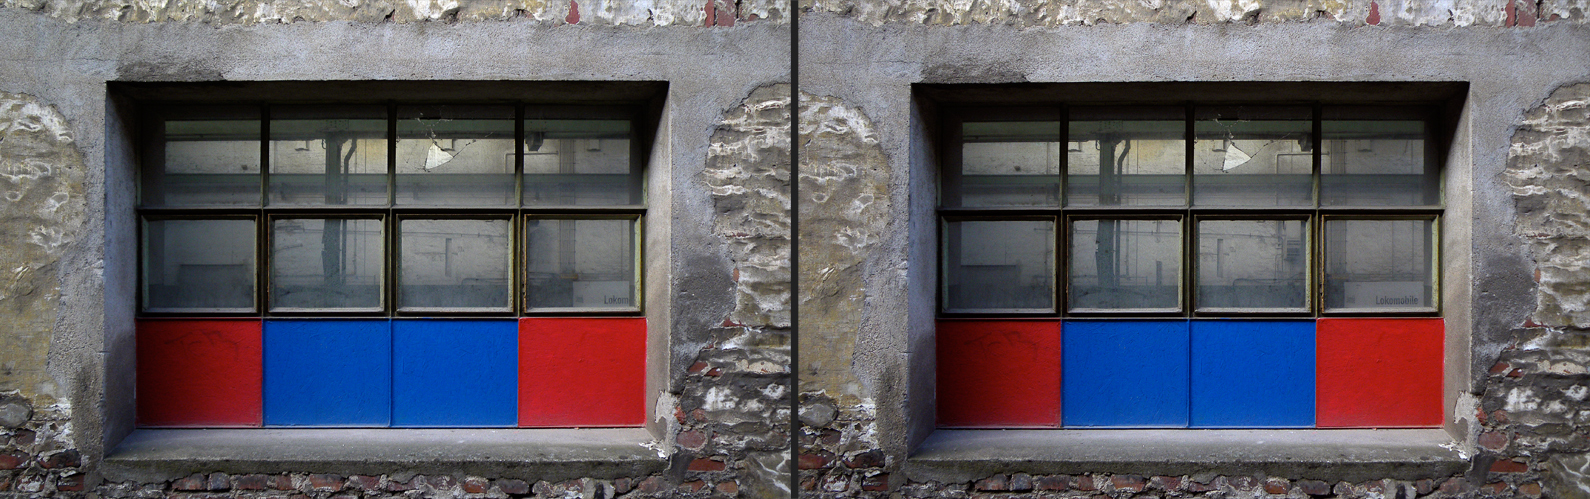 Mondriaans posthumer Durchblick